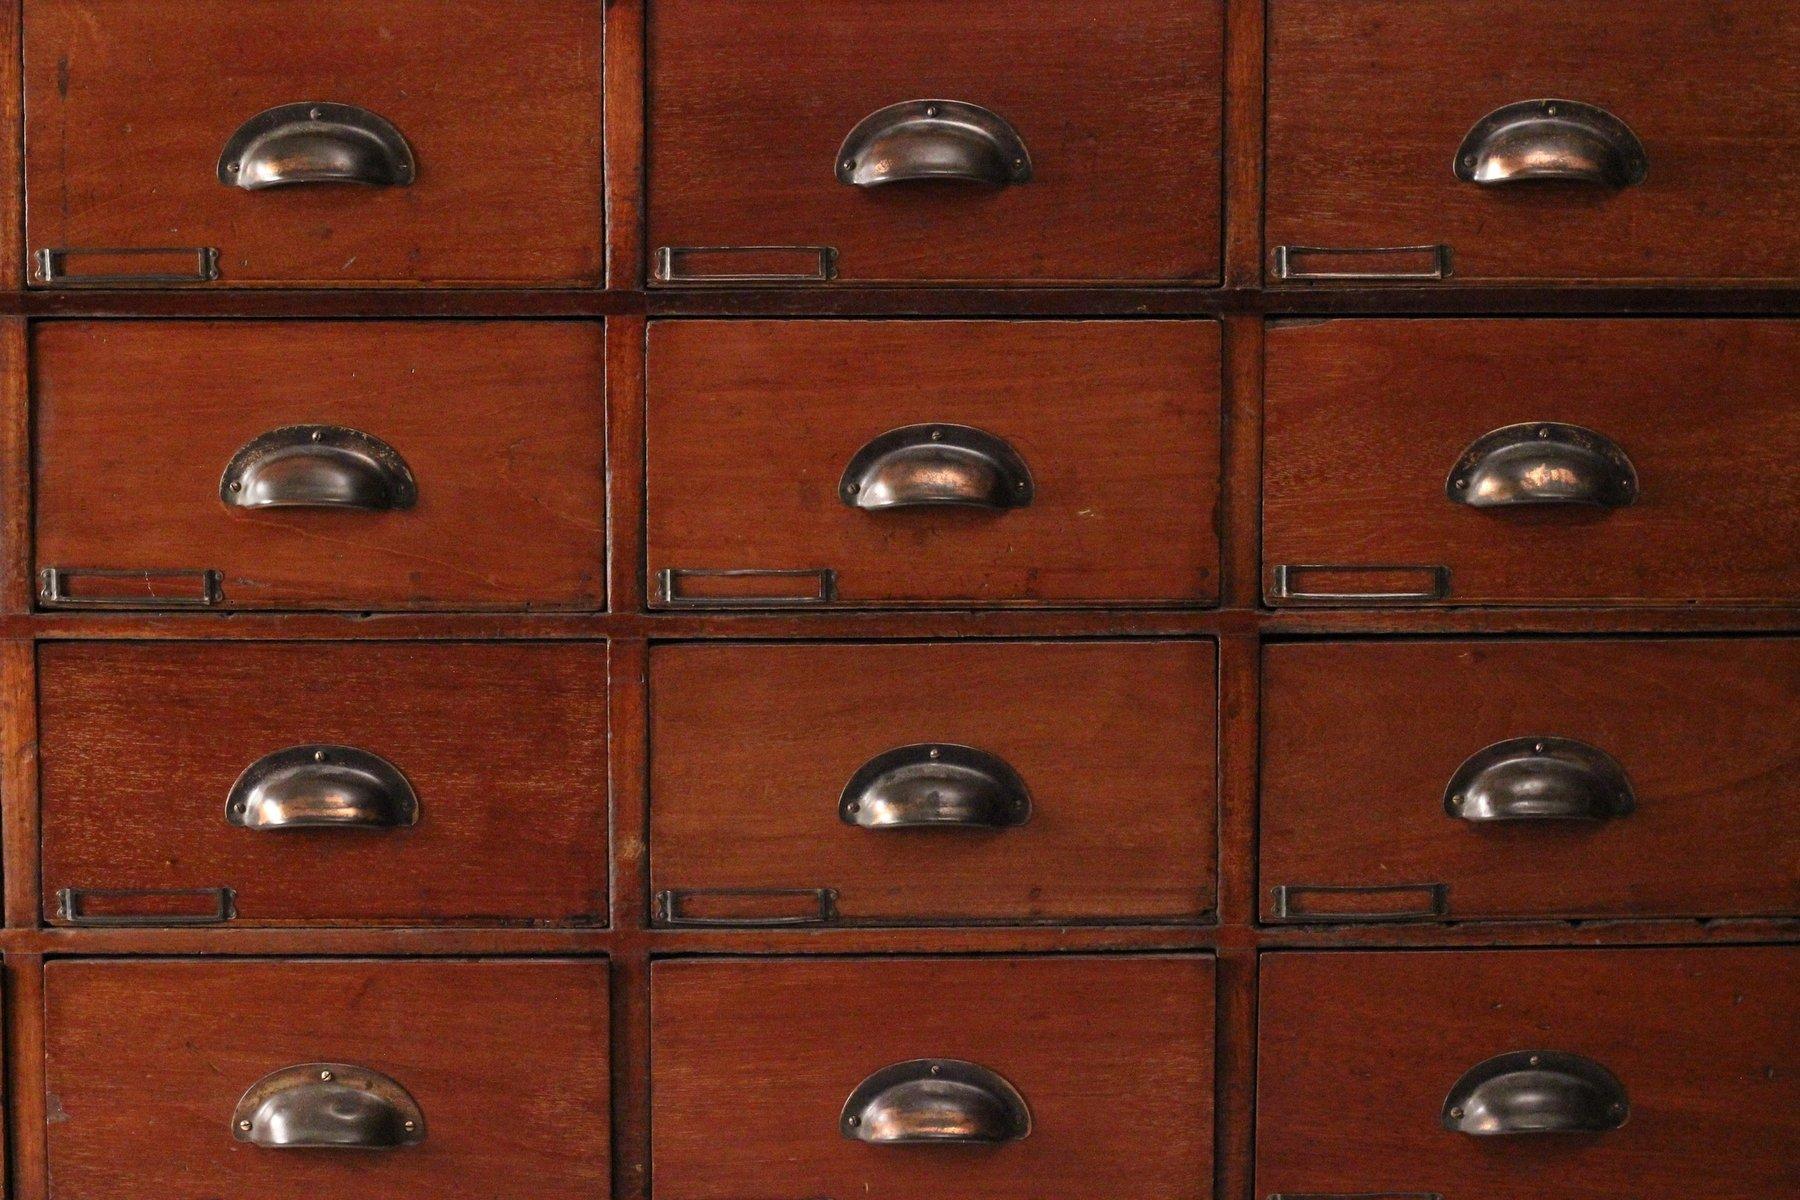 armoire pharmacie victorienne en vente sur pamono. Black Bedroom Furniture Sets. Home Design Ideas